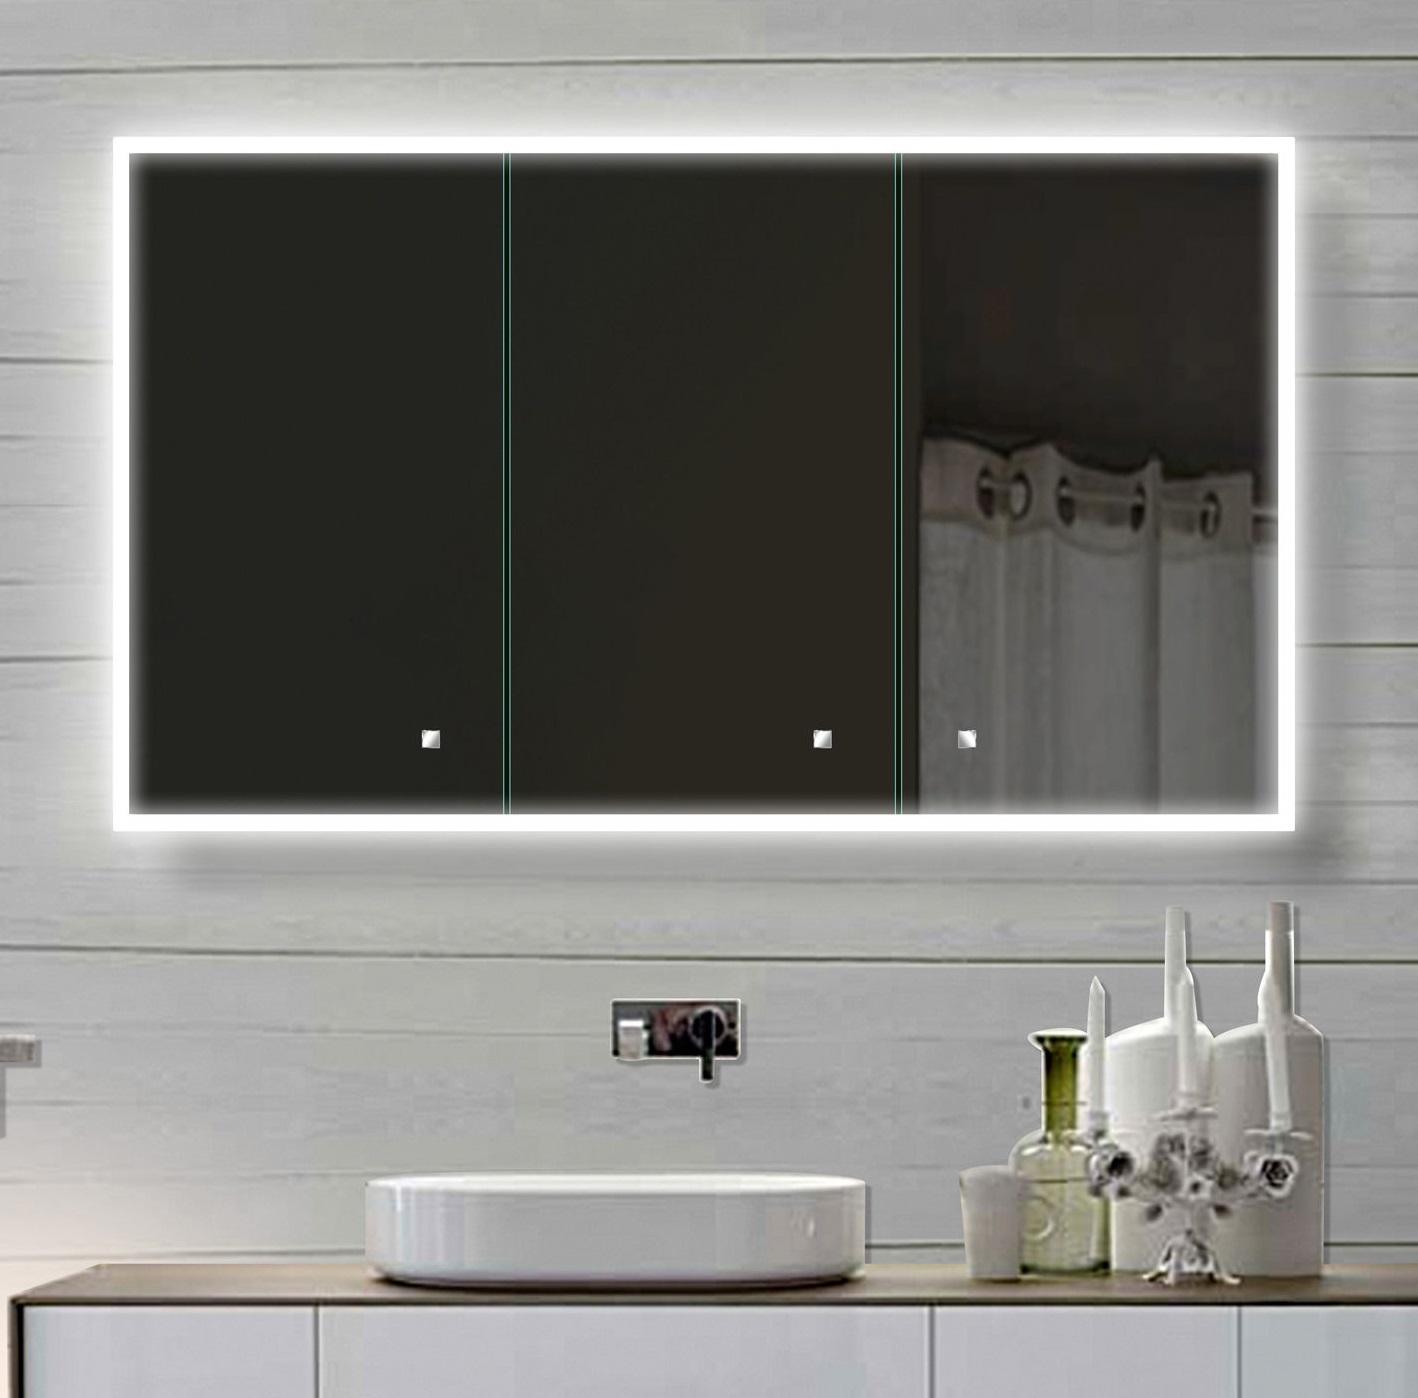 LED Spiegelschrank 120x70 cm, 3-türig Alurahmen